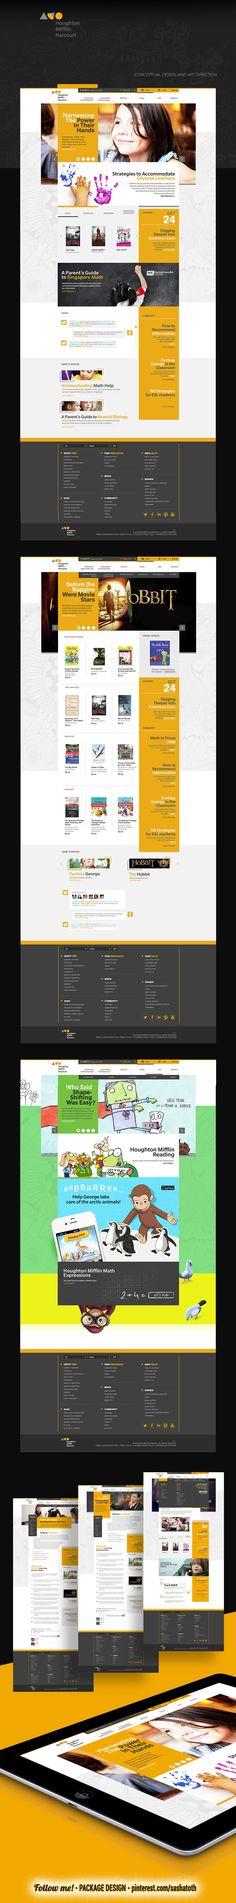 HMH - Houghton Hifflin Harcourt (Conceptual design) by Leo Van, via Behance *** #web #design #behance